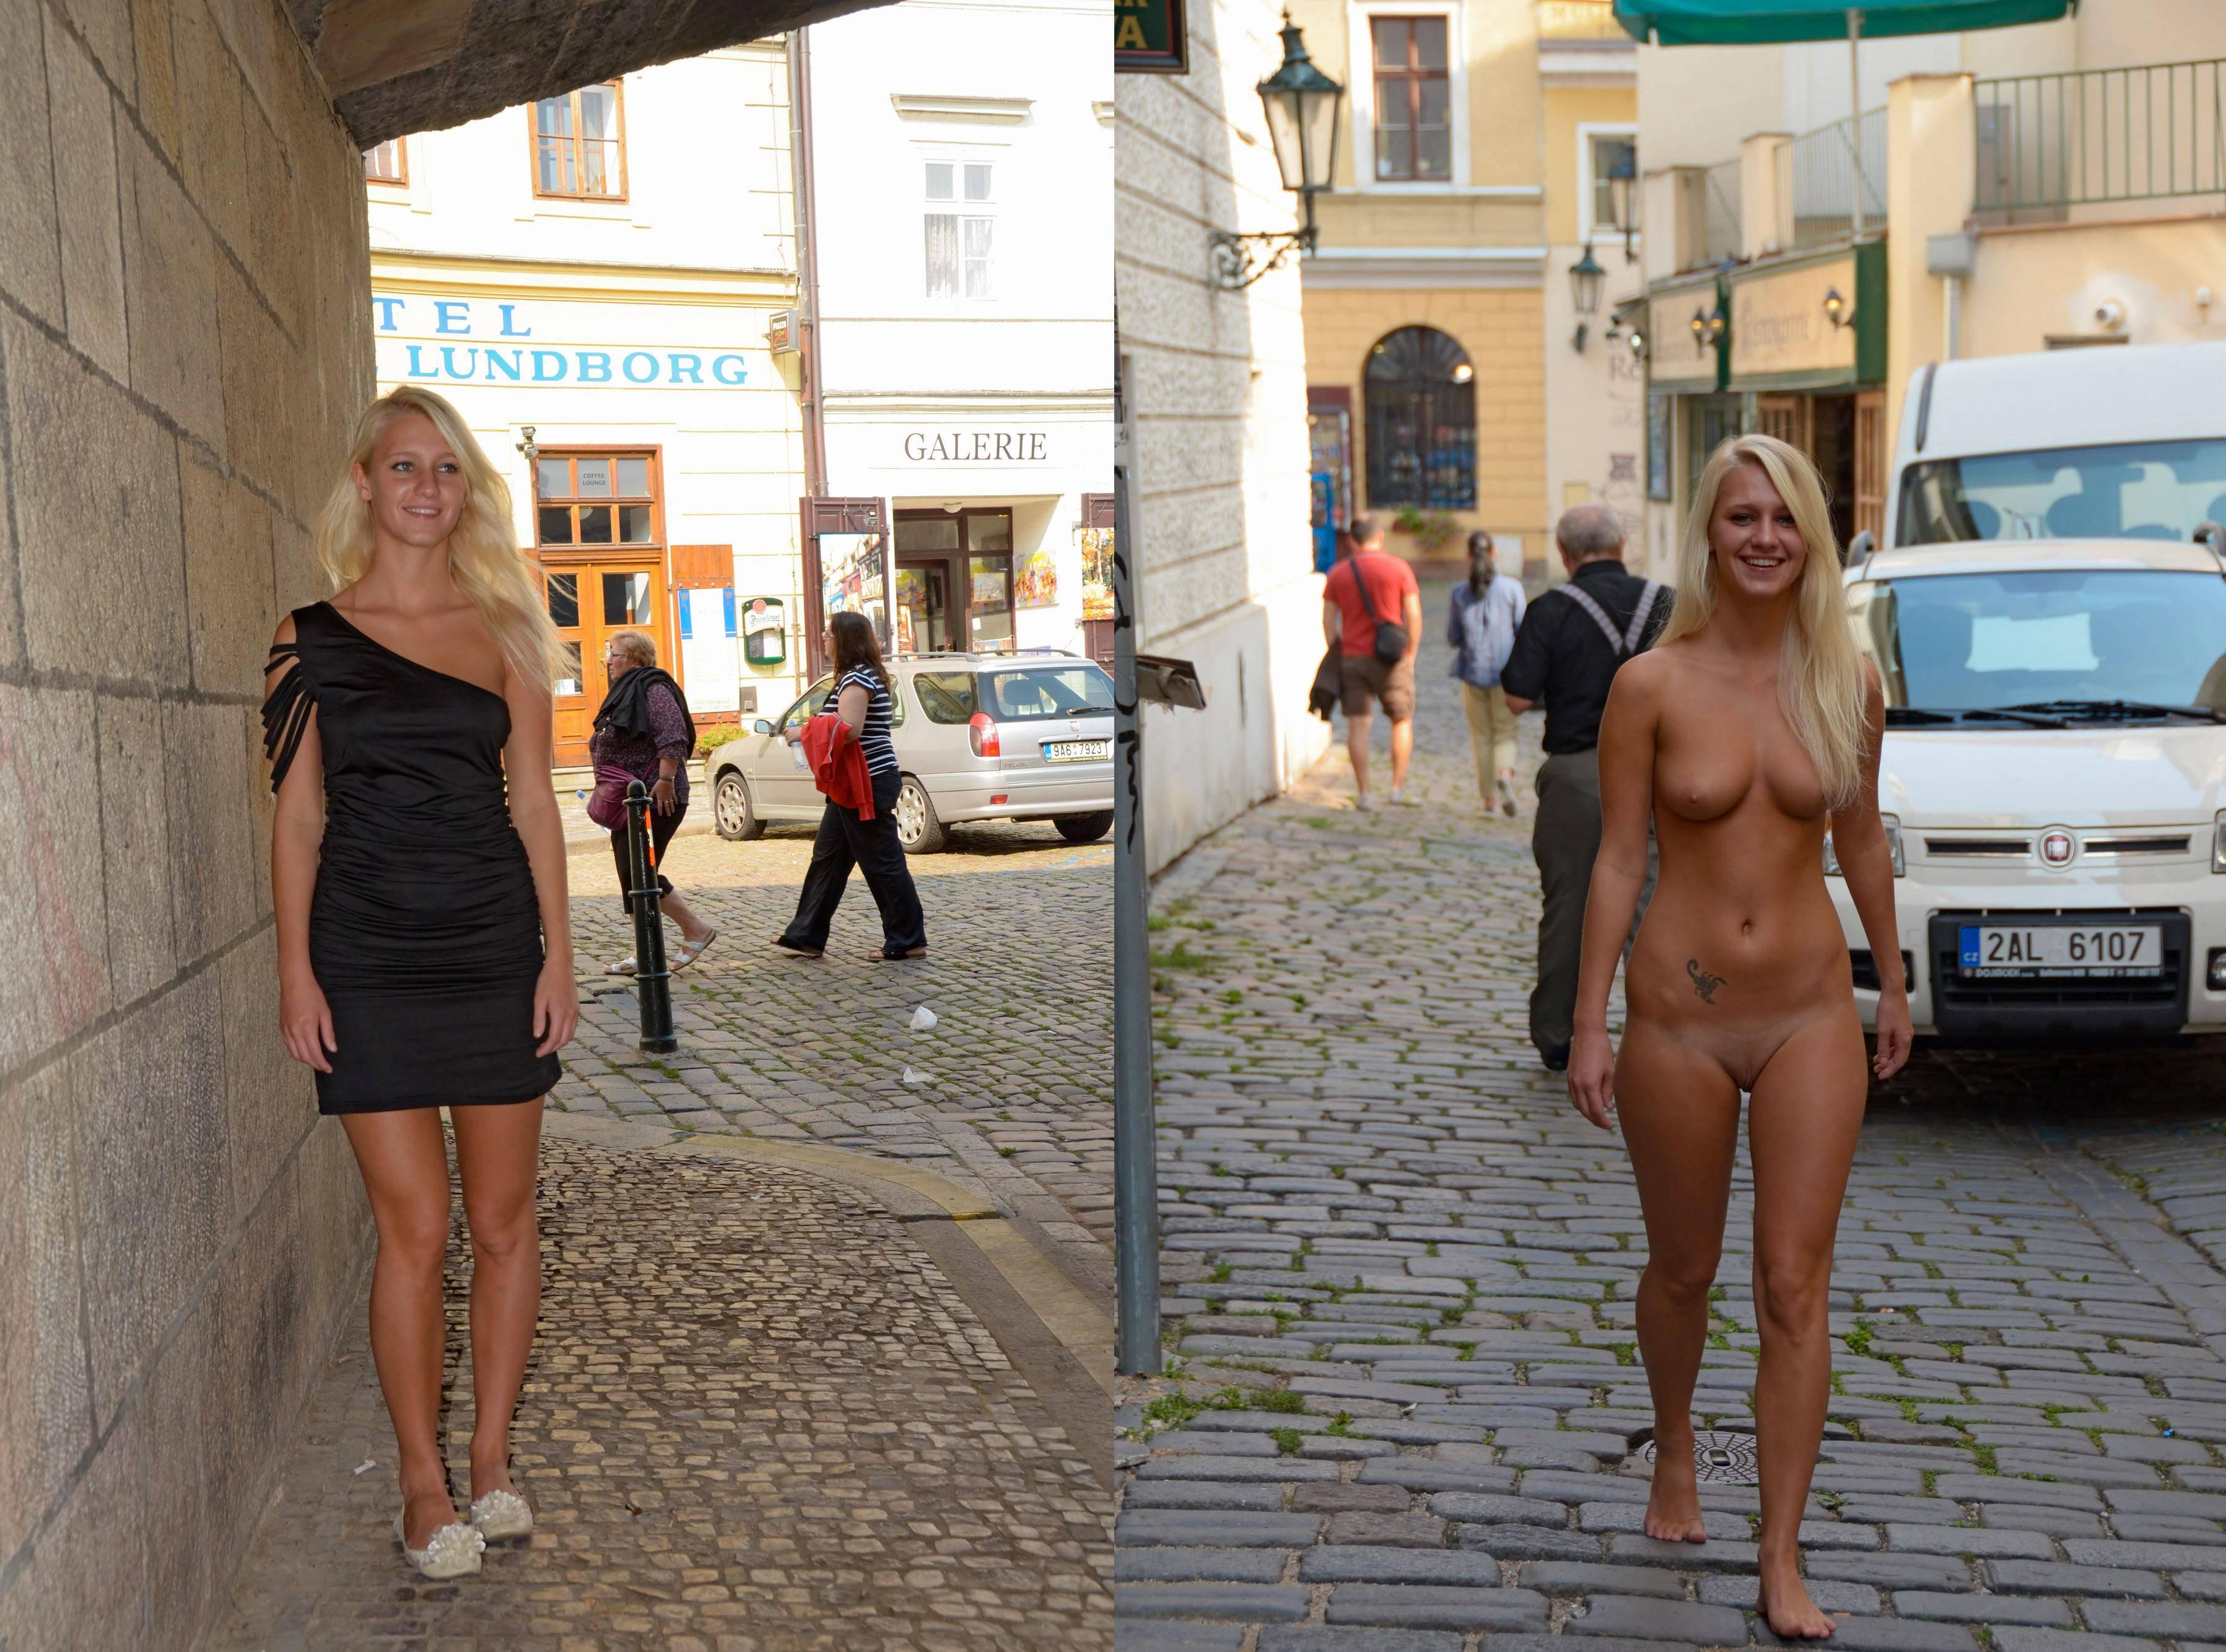 7ruorg AANR  Nudist  American Association for Nude Recr